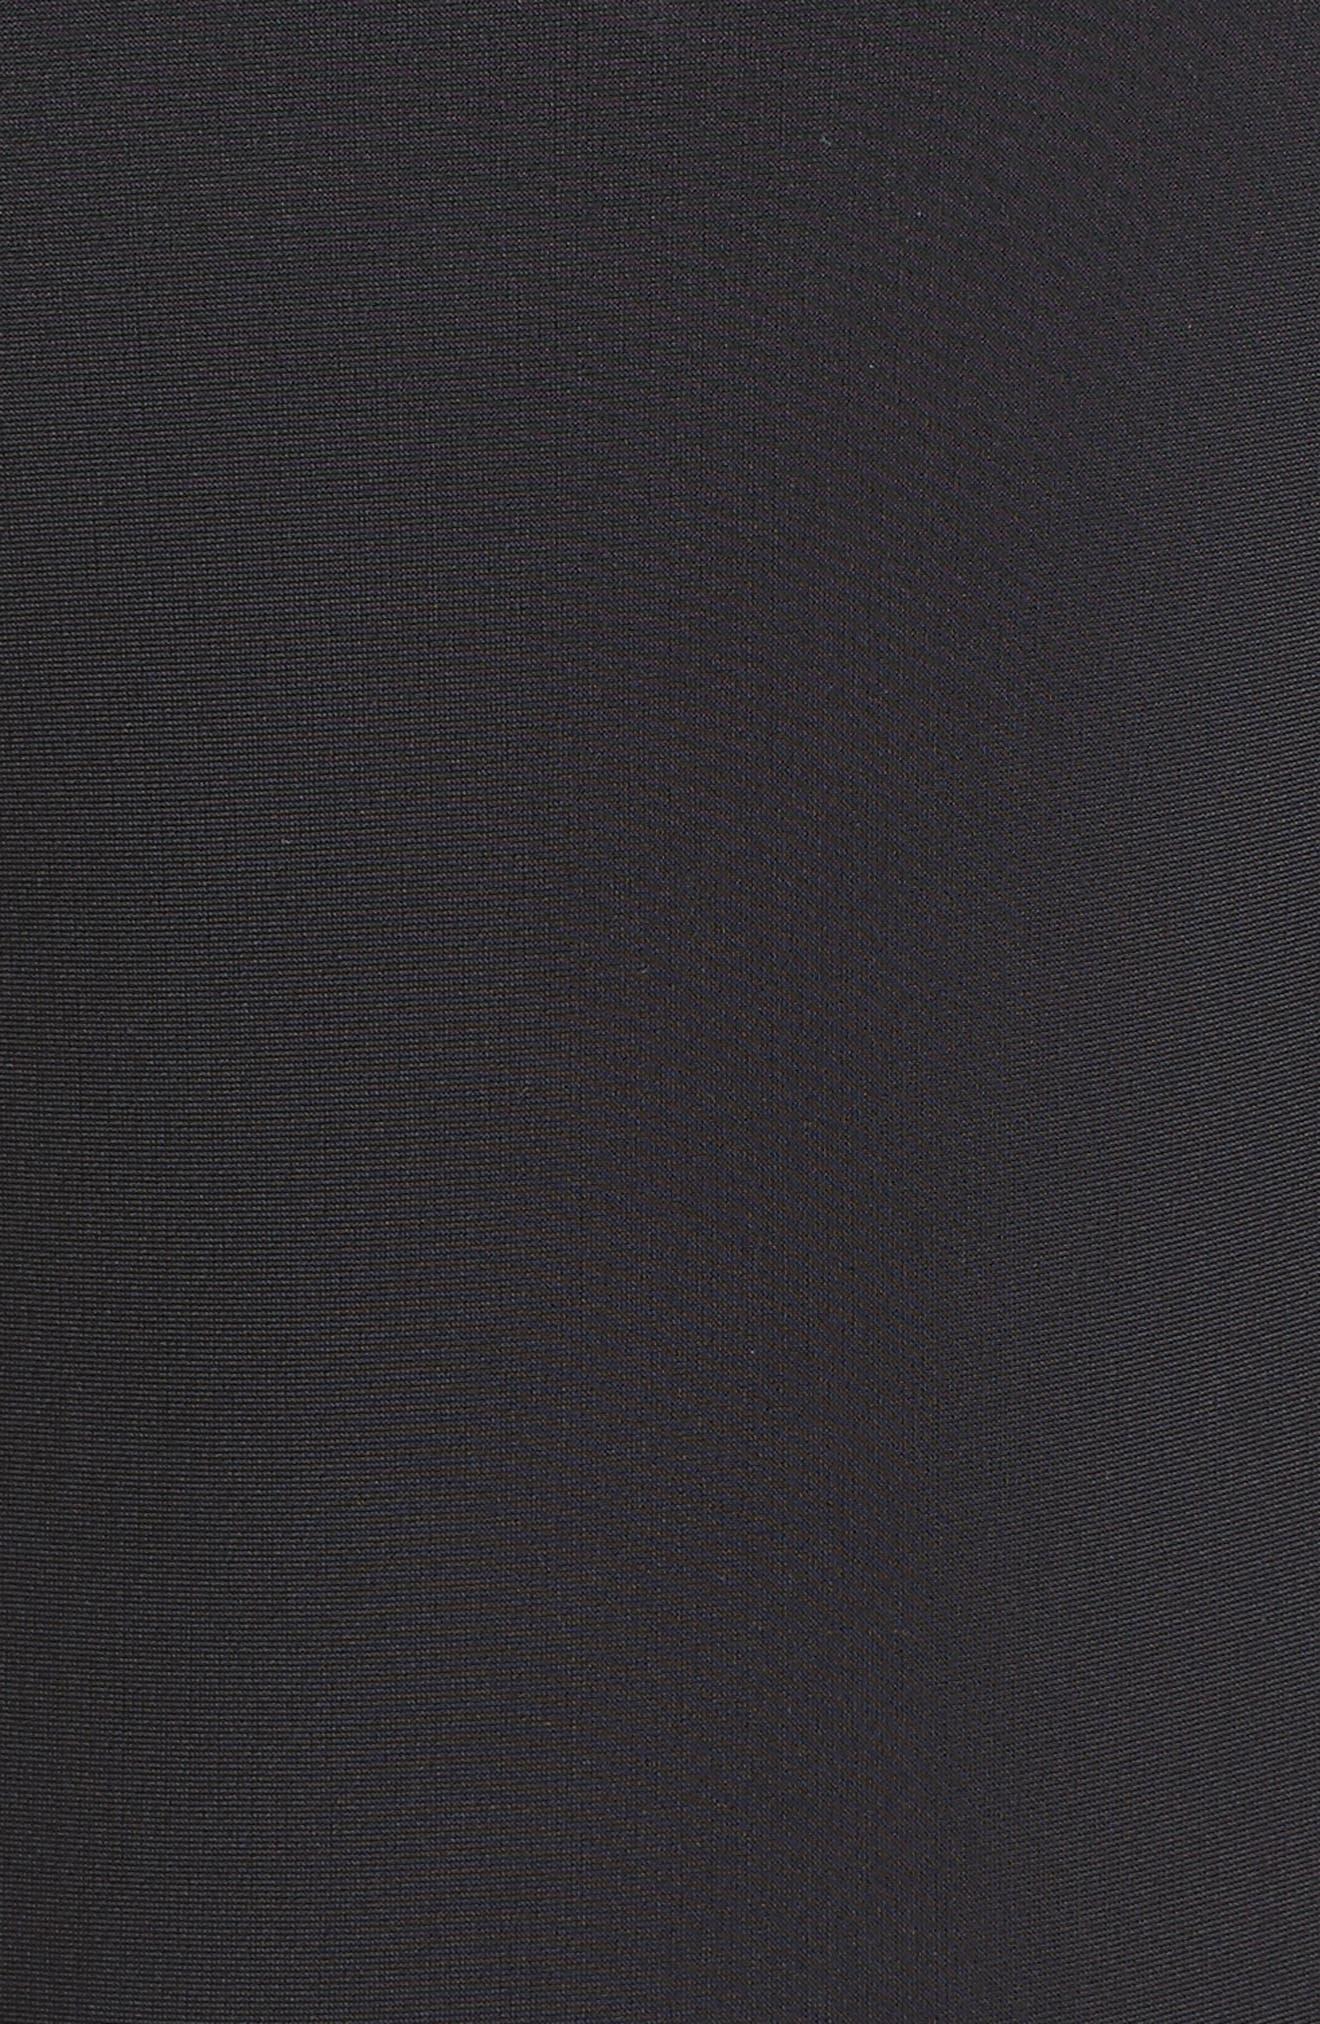 Saldana One-Piece Cutout Swimsuit,                             Alternate thumbnail 5, color,                             Black